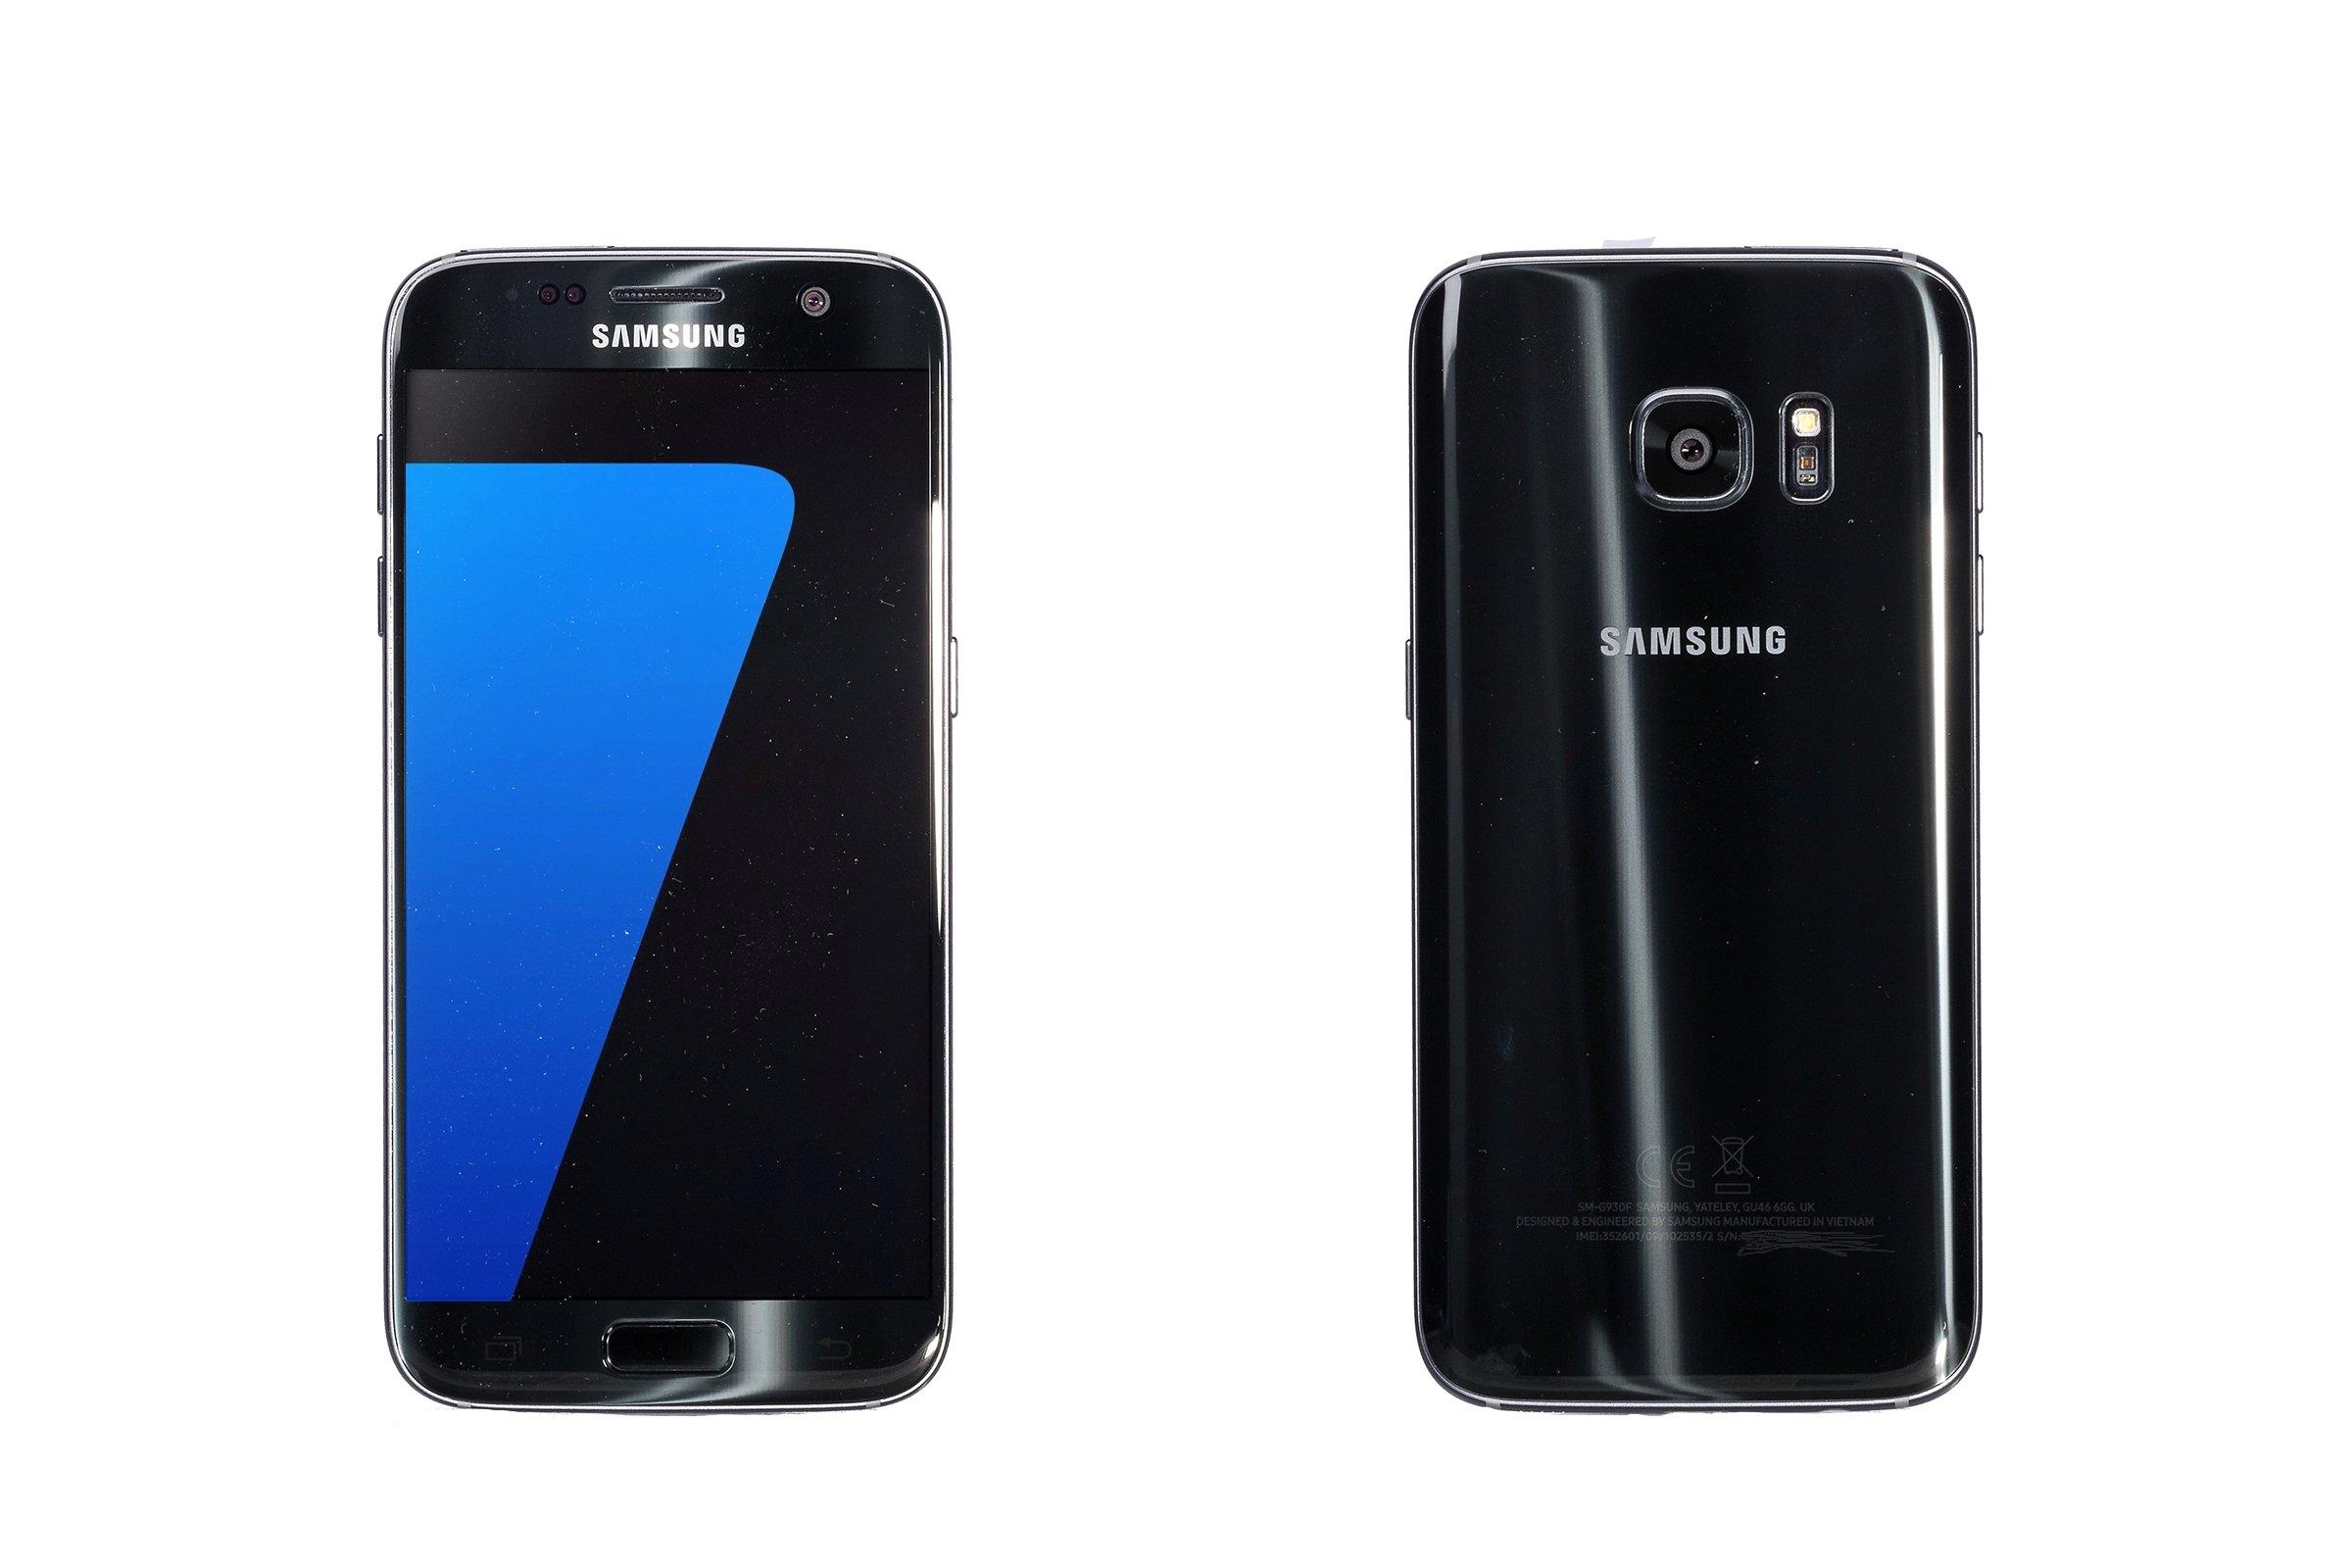 Samsung Galaxy S7 Black Onyx SM-G930F replacement box